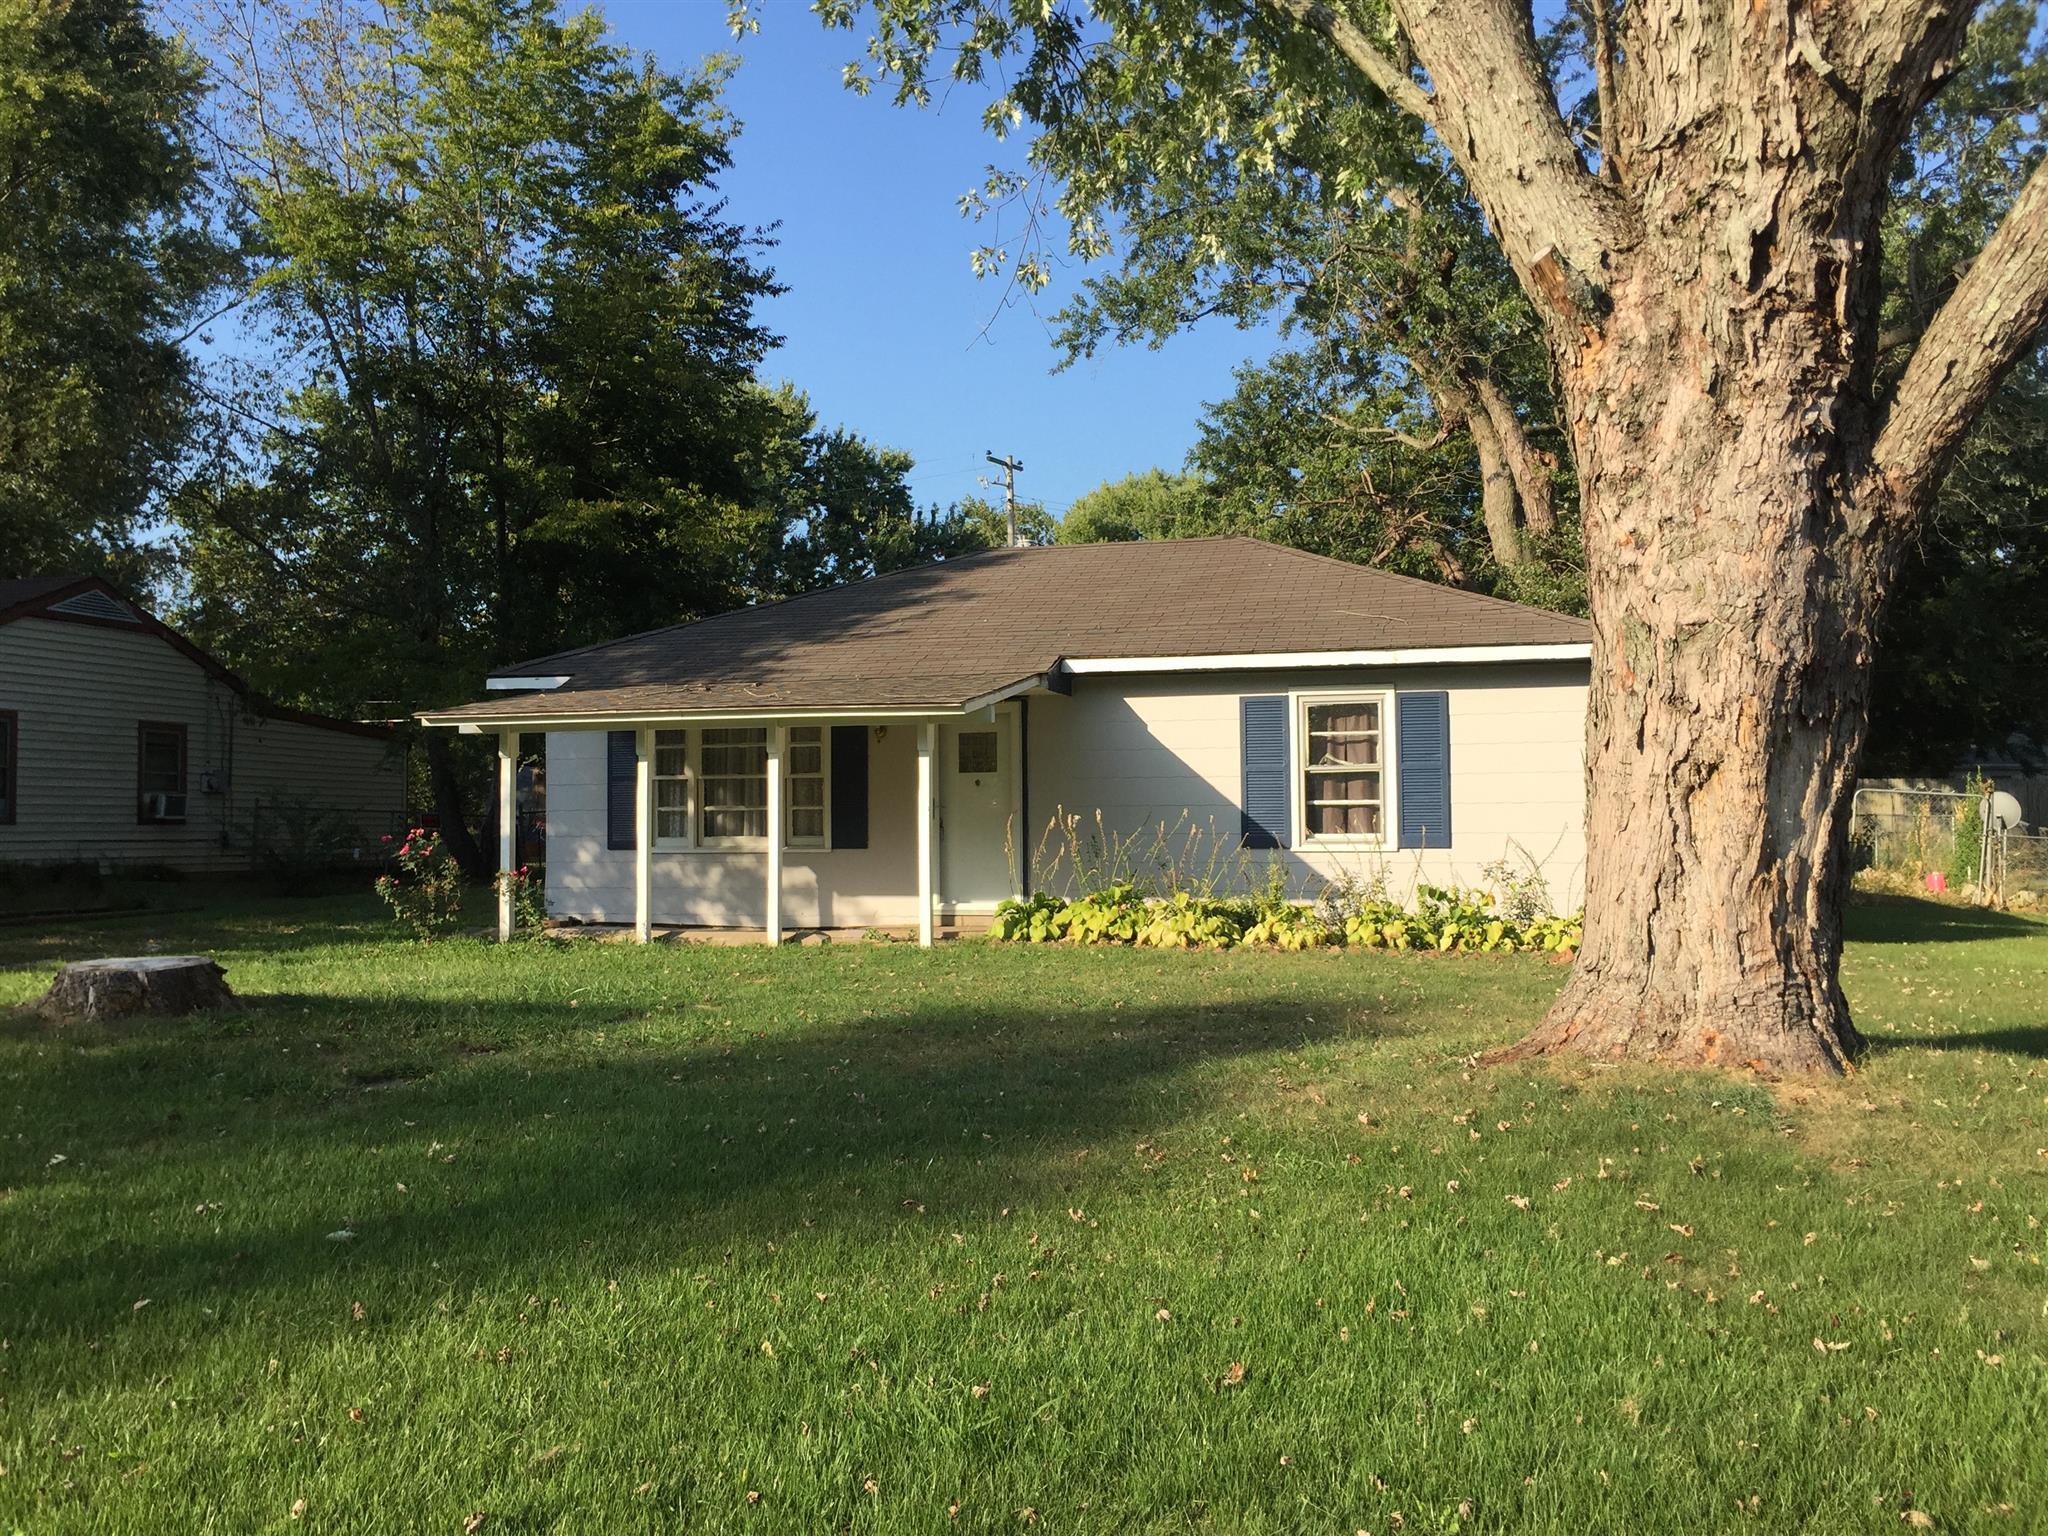 1722 Mosely Dr, Hopkinsville, KY 42240 - Hopkinsville, KY real estate listing